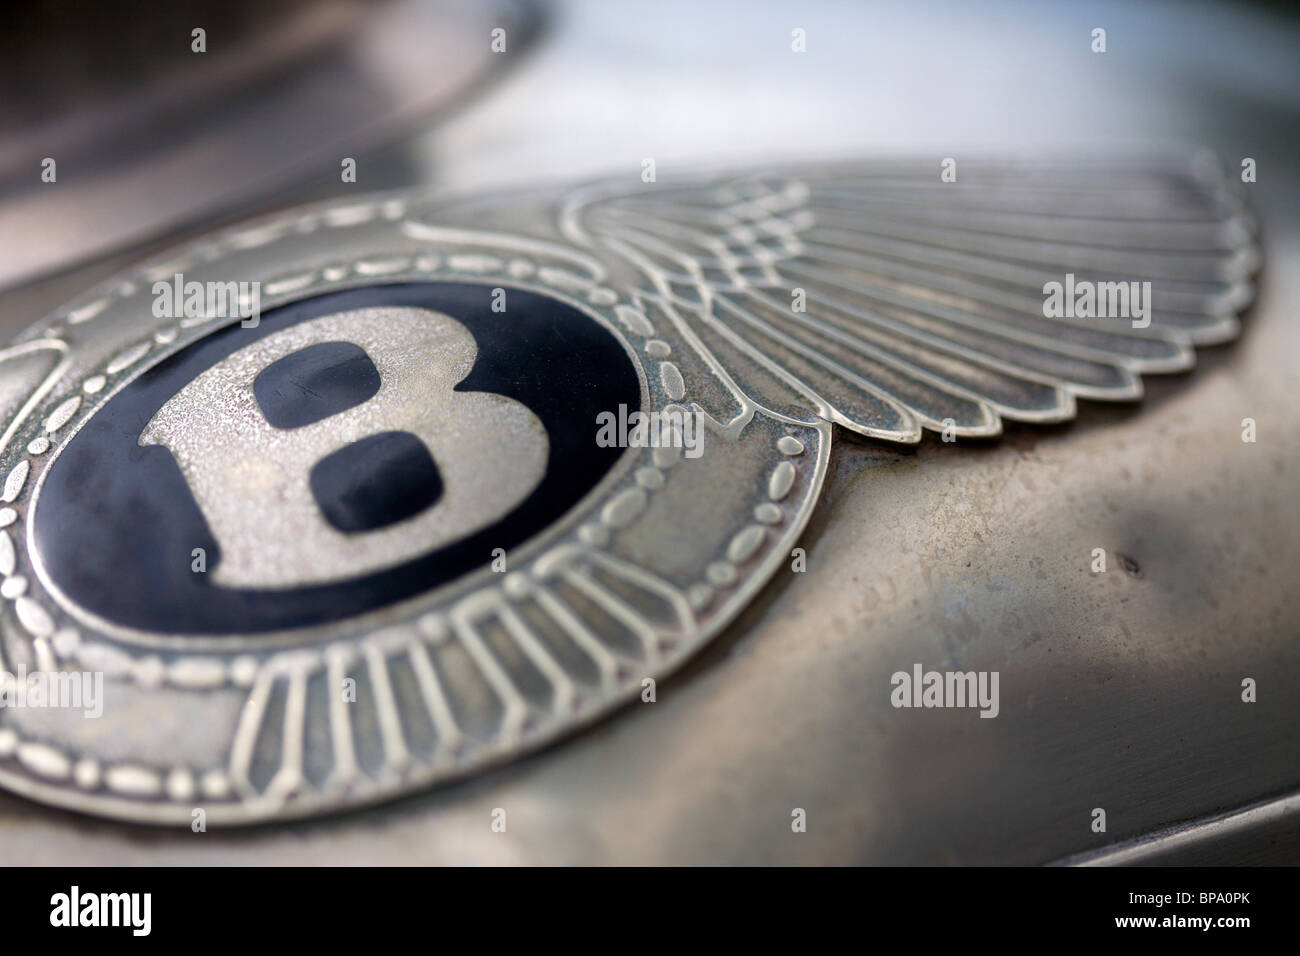 Bently Stock Photos & Bently Stock Images - Alamy on